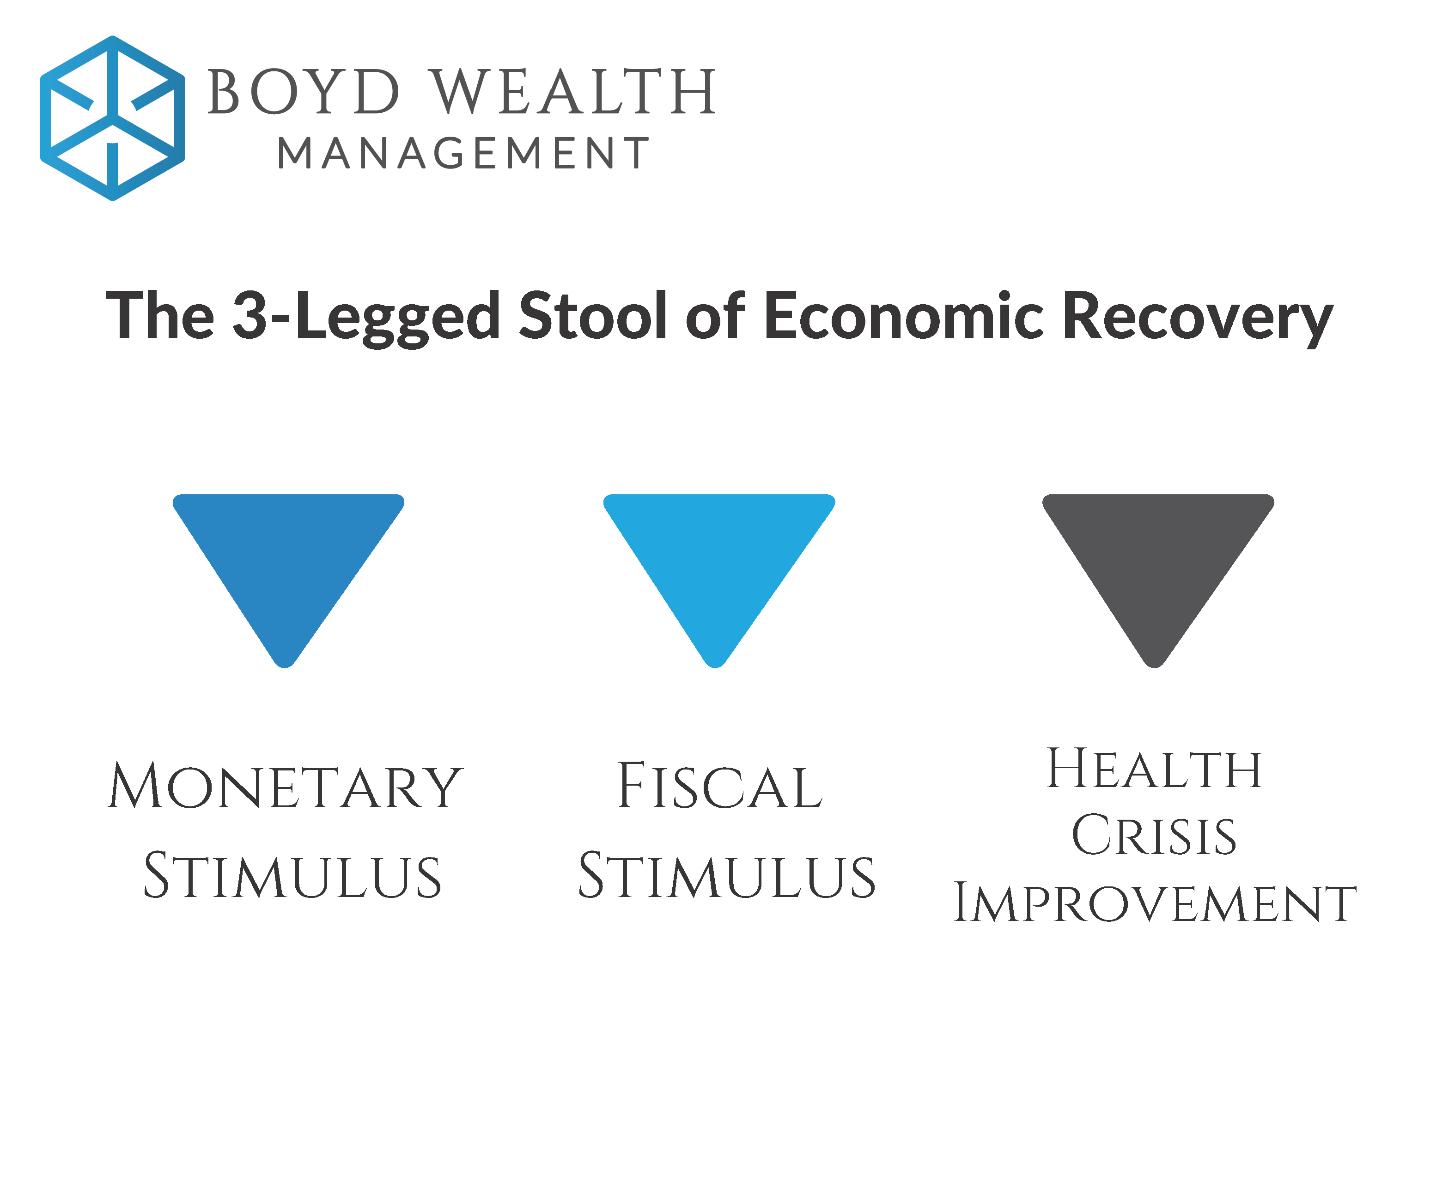 3-Legged Stool of Economic Recovery